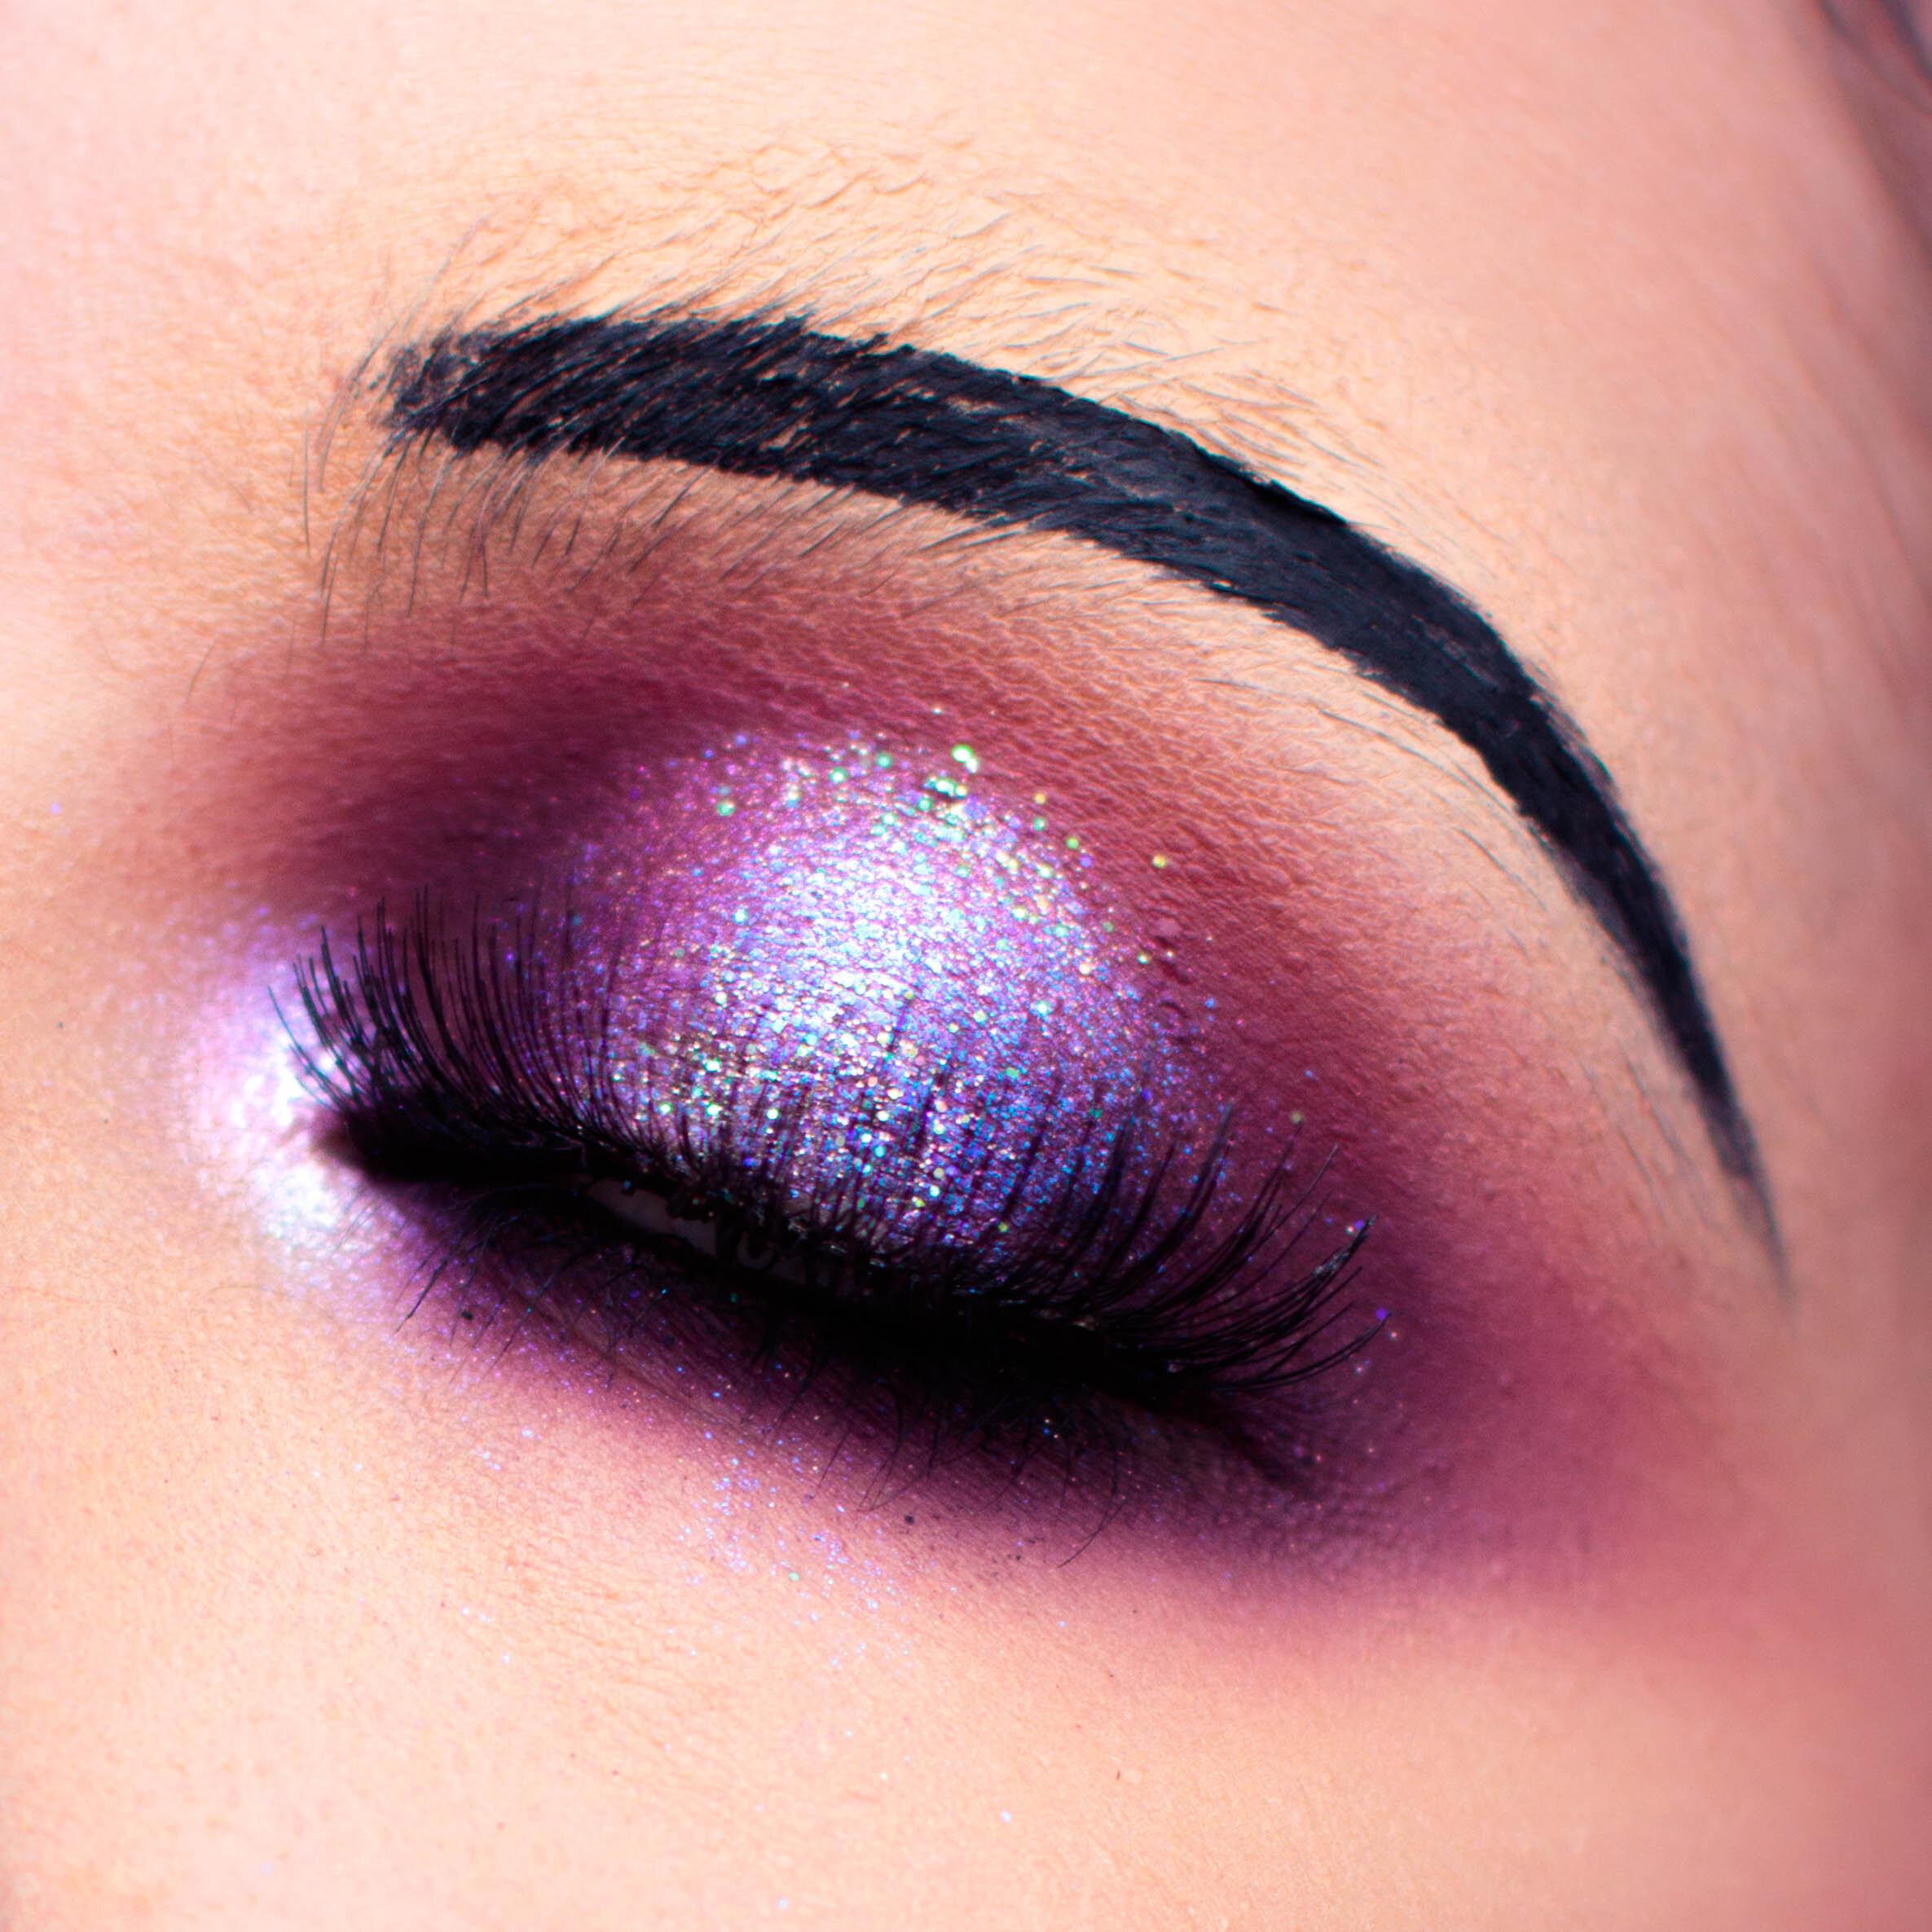 vintage-vampire-halloween-makeup-pauuulette-close-up.jpg